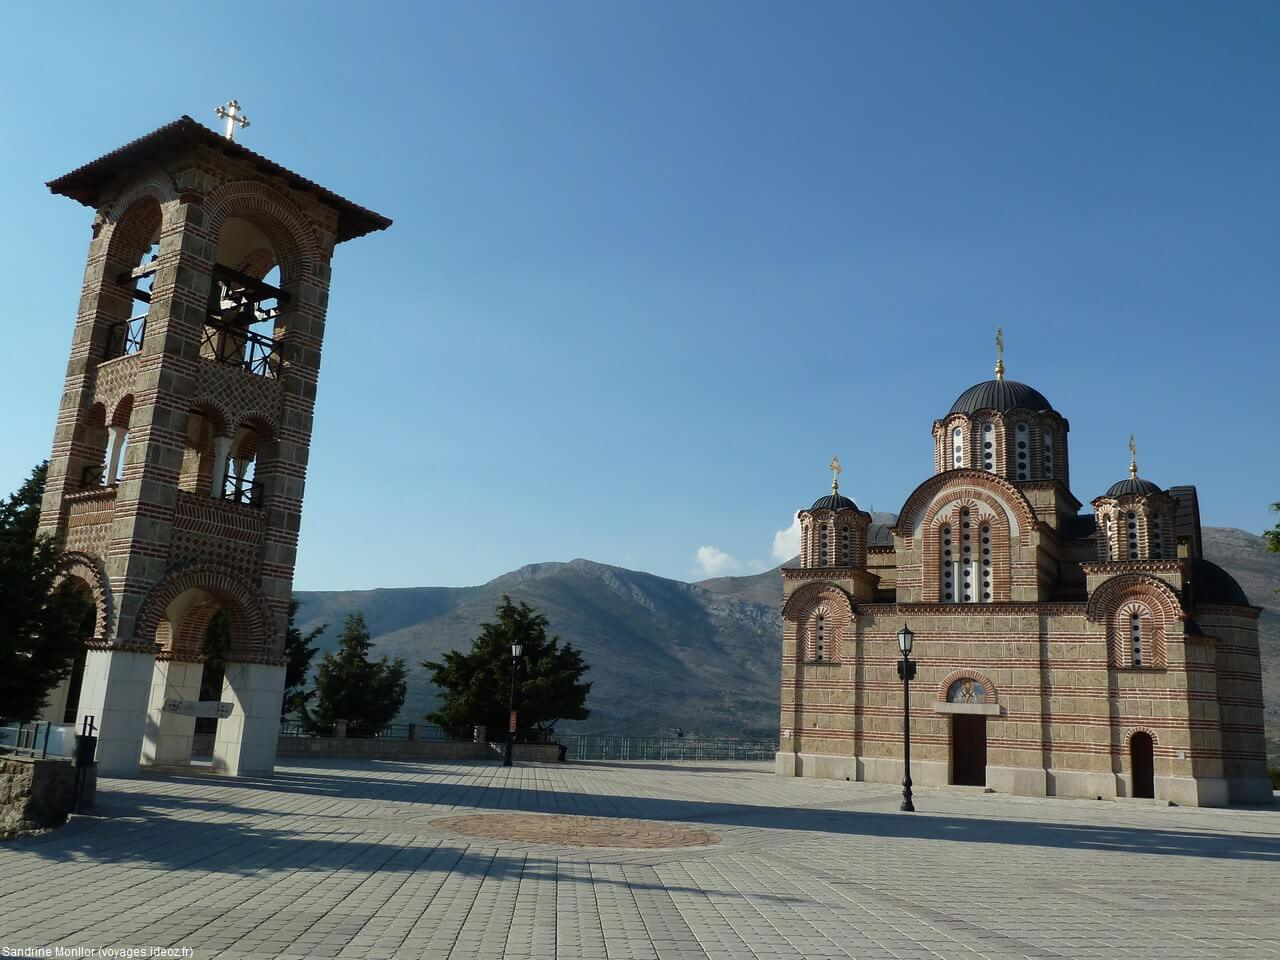 Hercegovacka Gracanica cathédrale orthodoxe de Trebinje